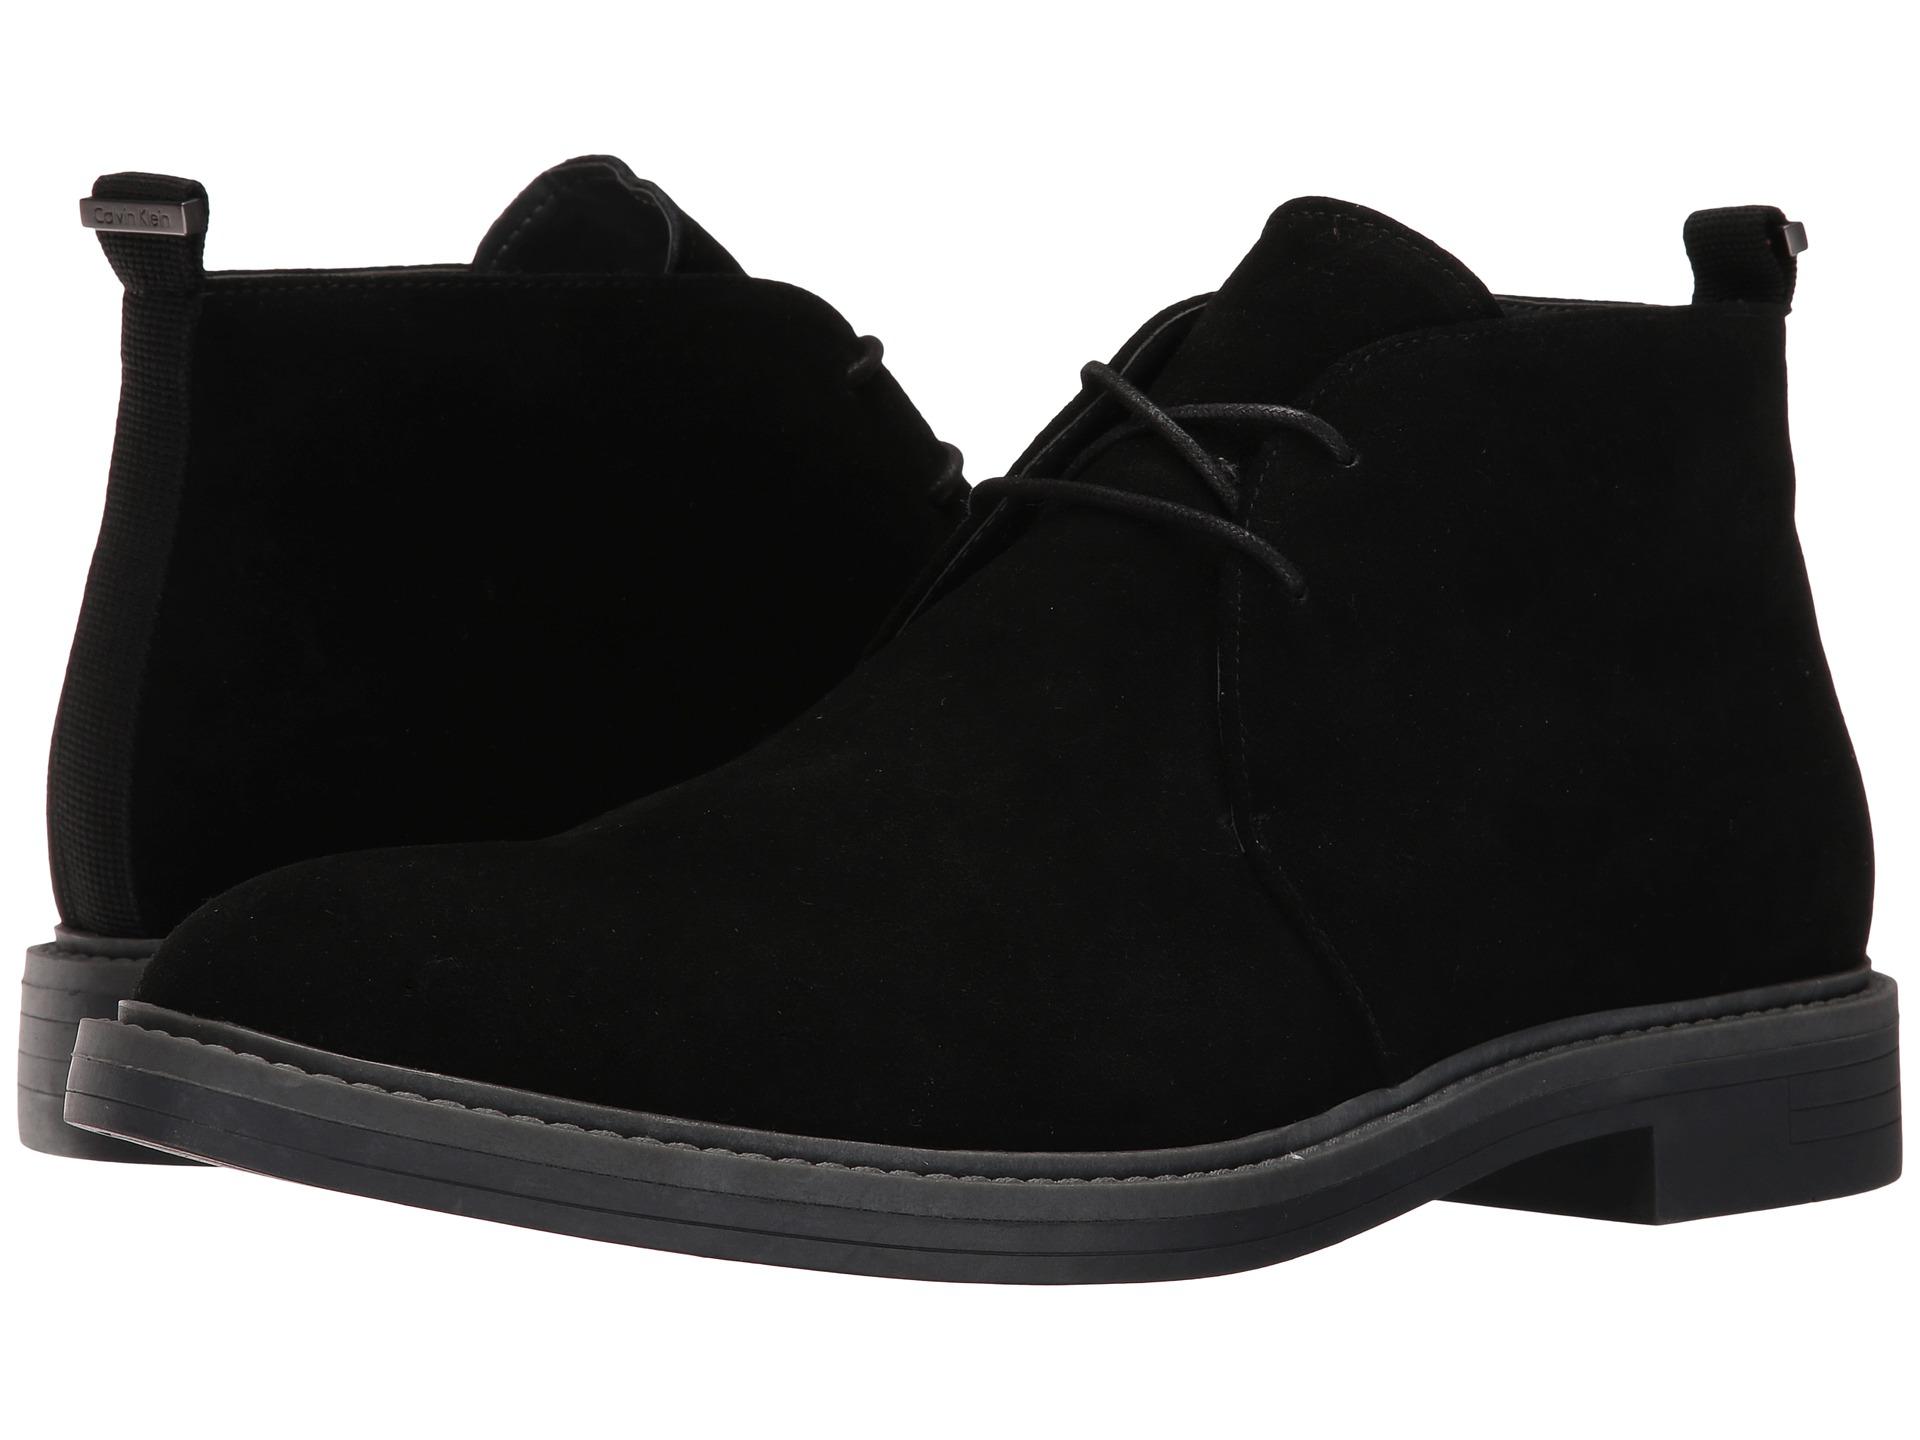 Calvin Klein, Boots, Men   Shipped Free at Zappos